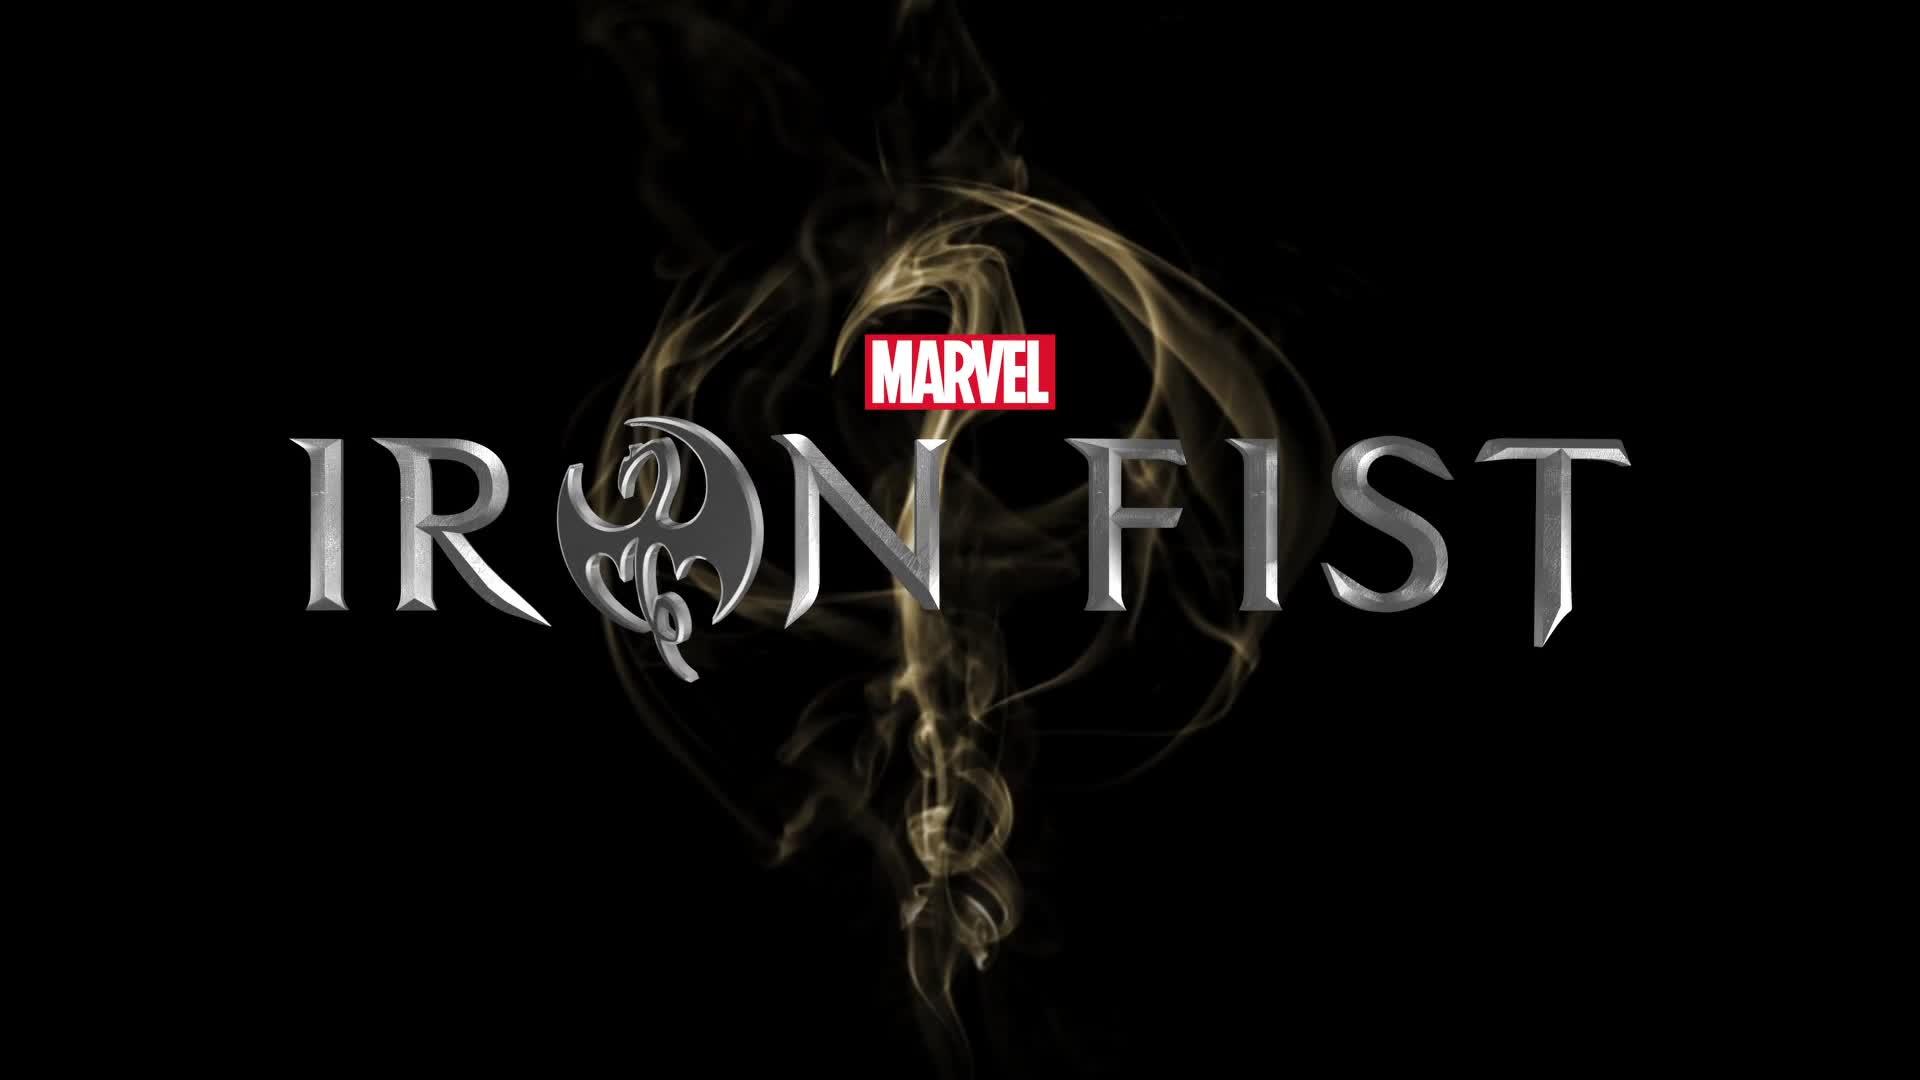 marvel iron fist logo wallpaper 65664